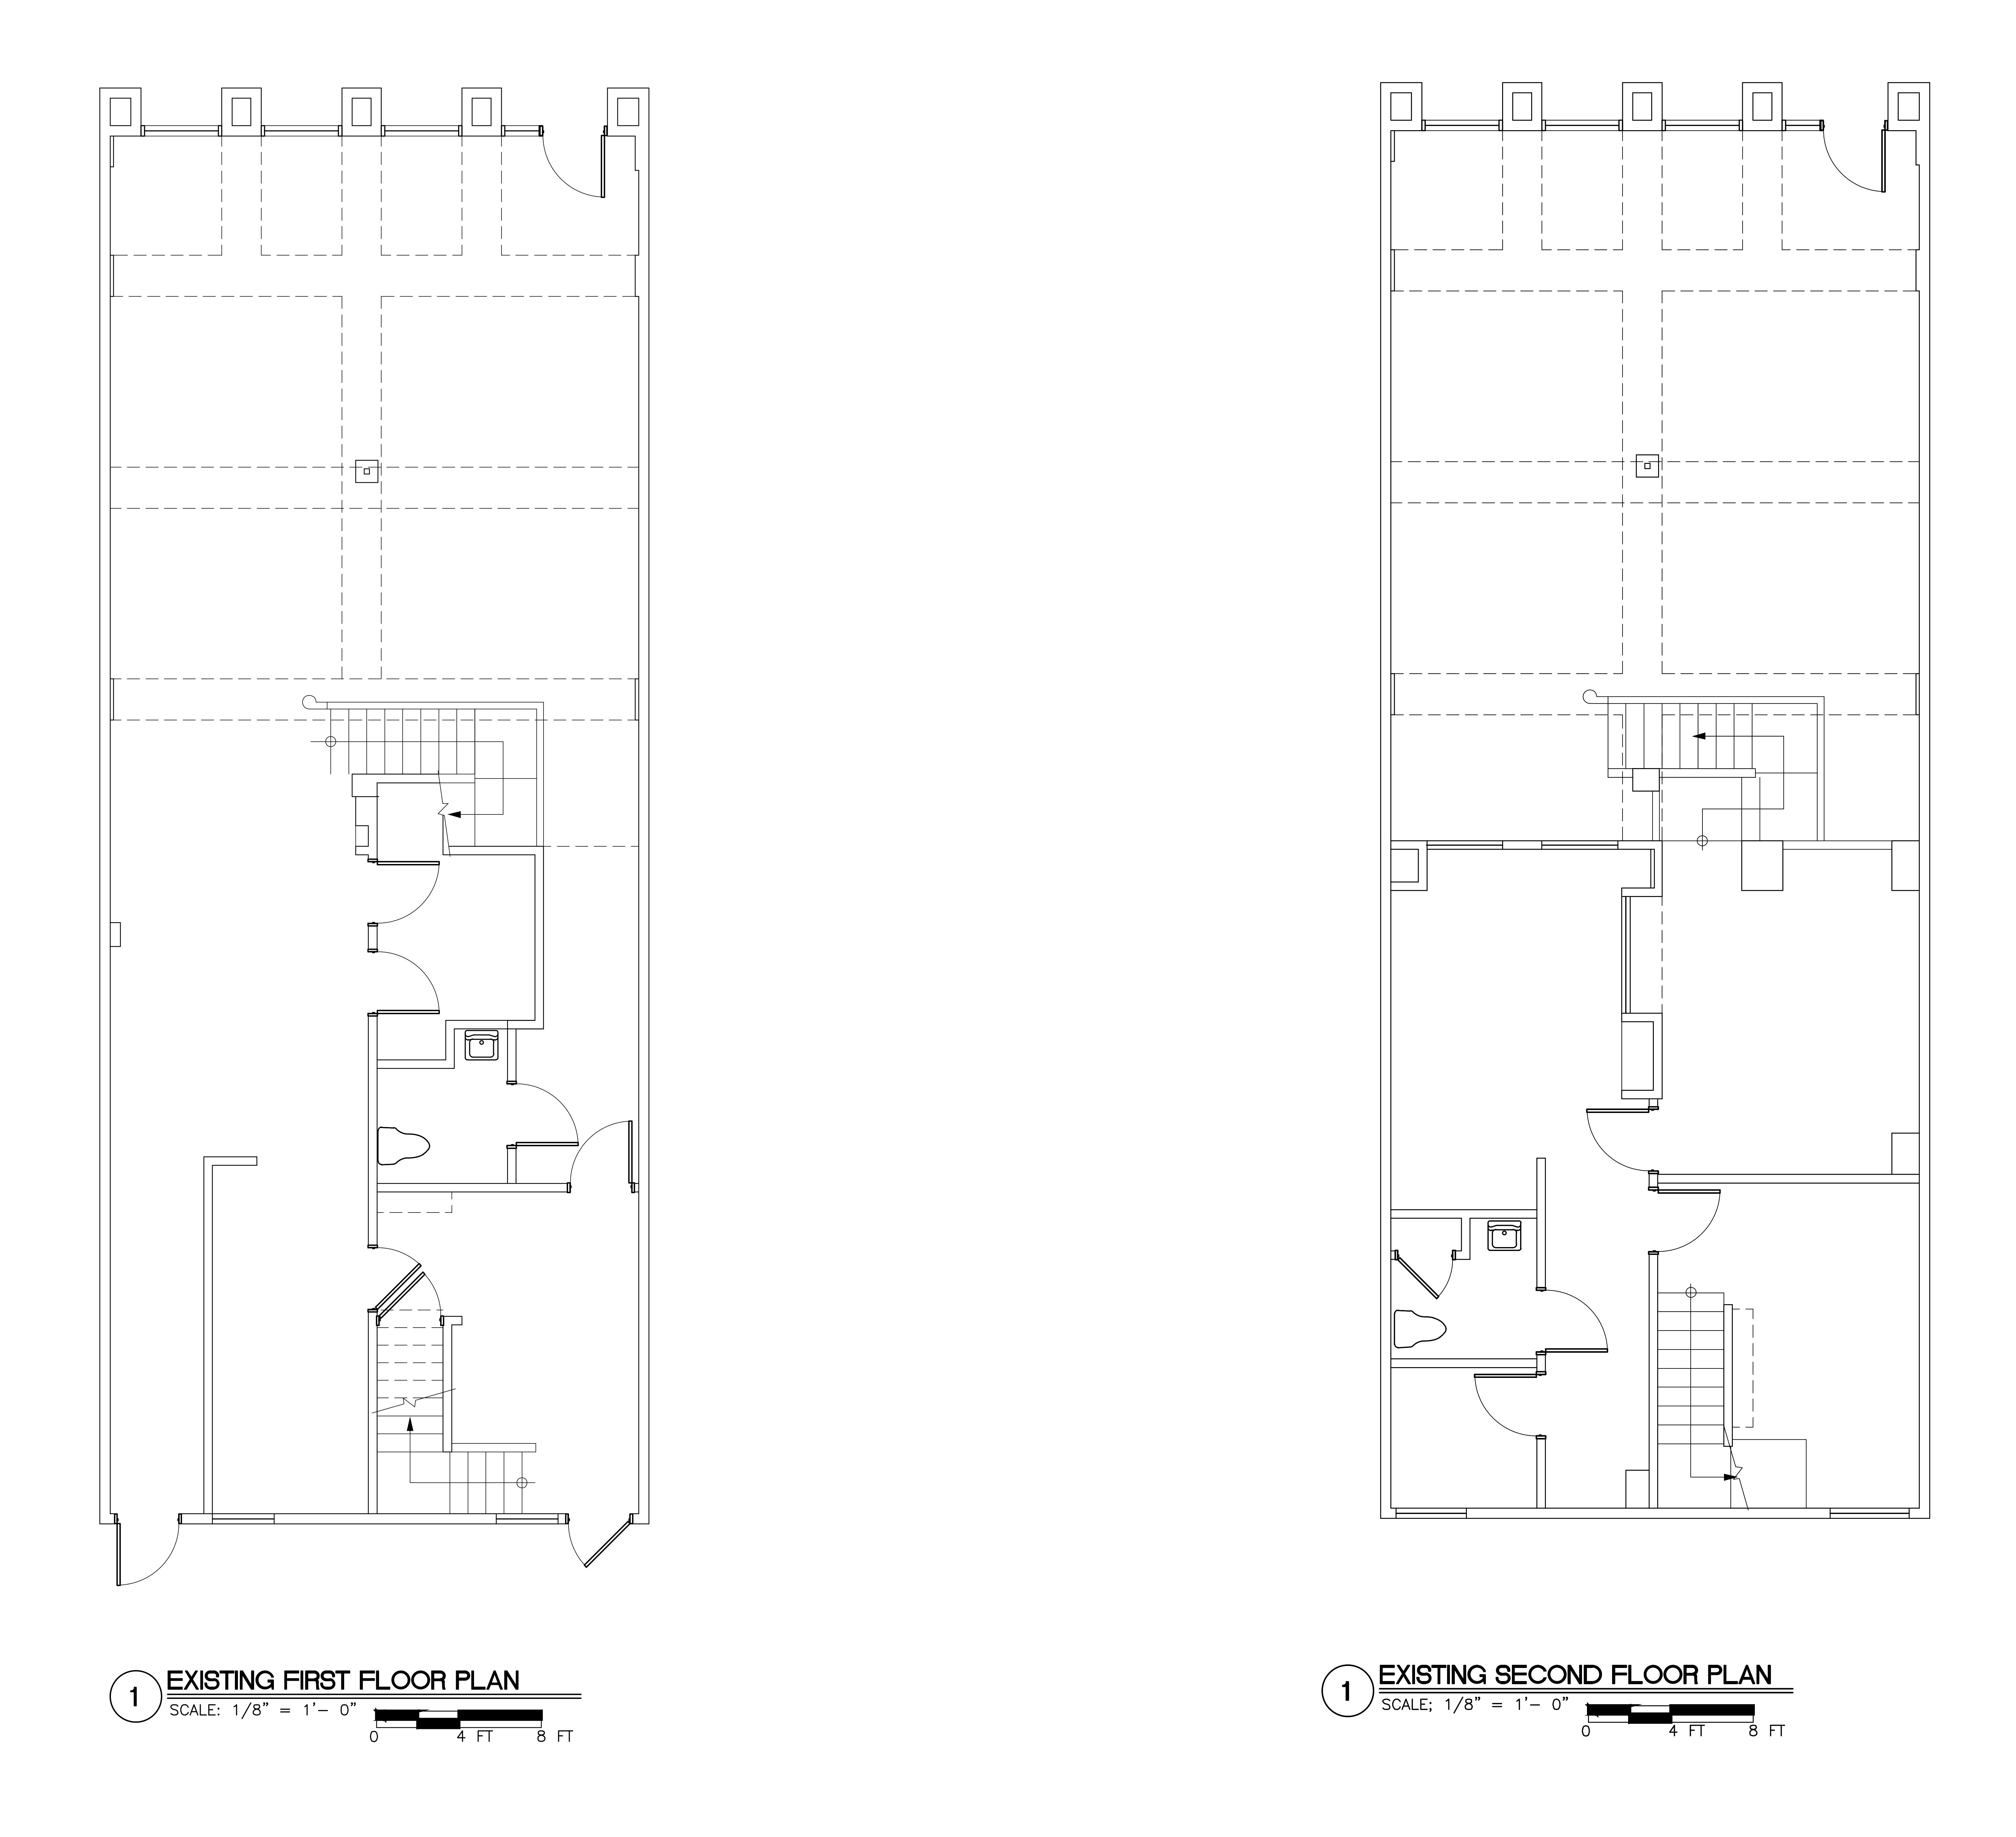 15231 Sunset Blvd.: site plan